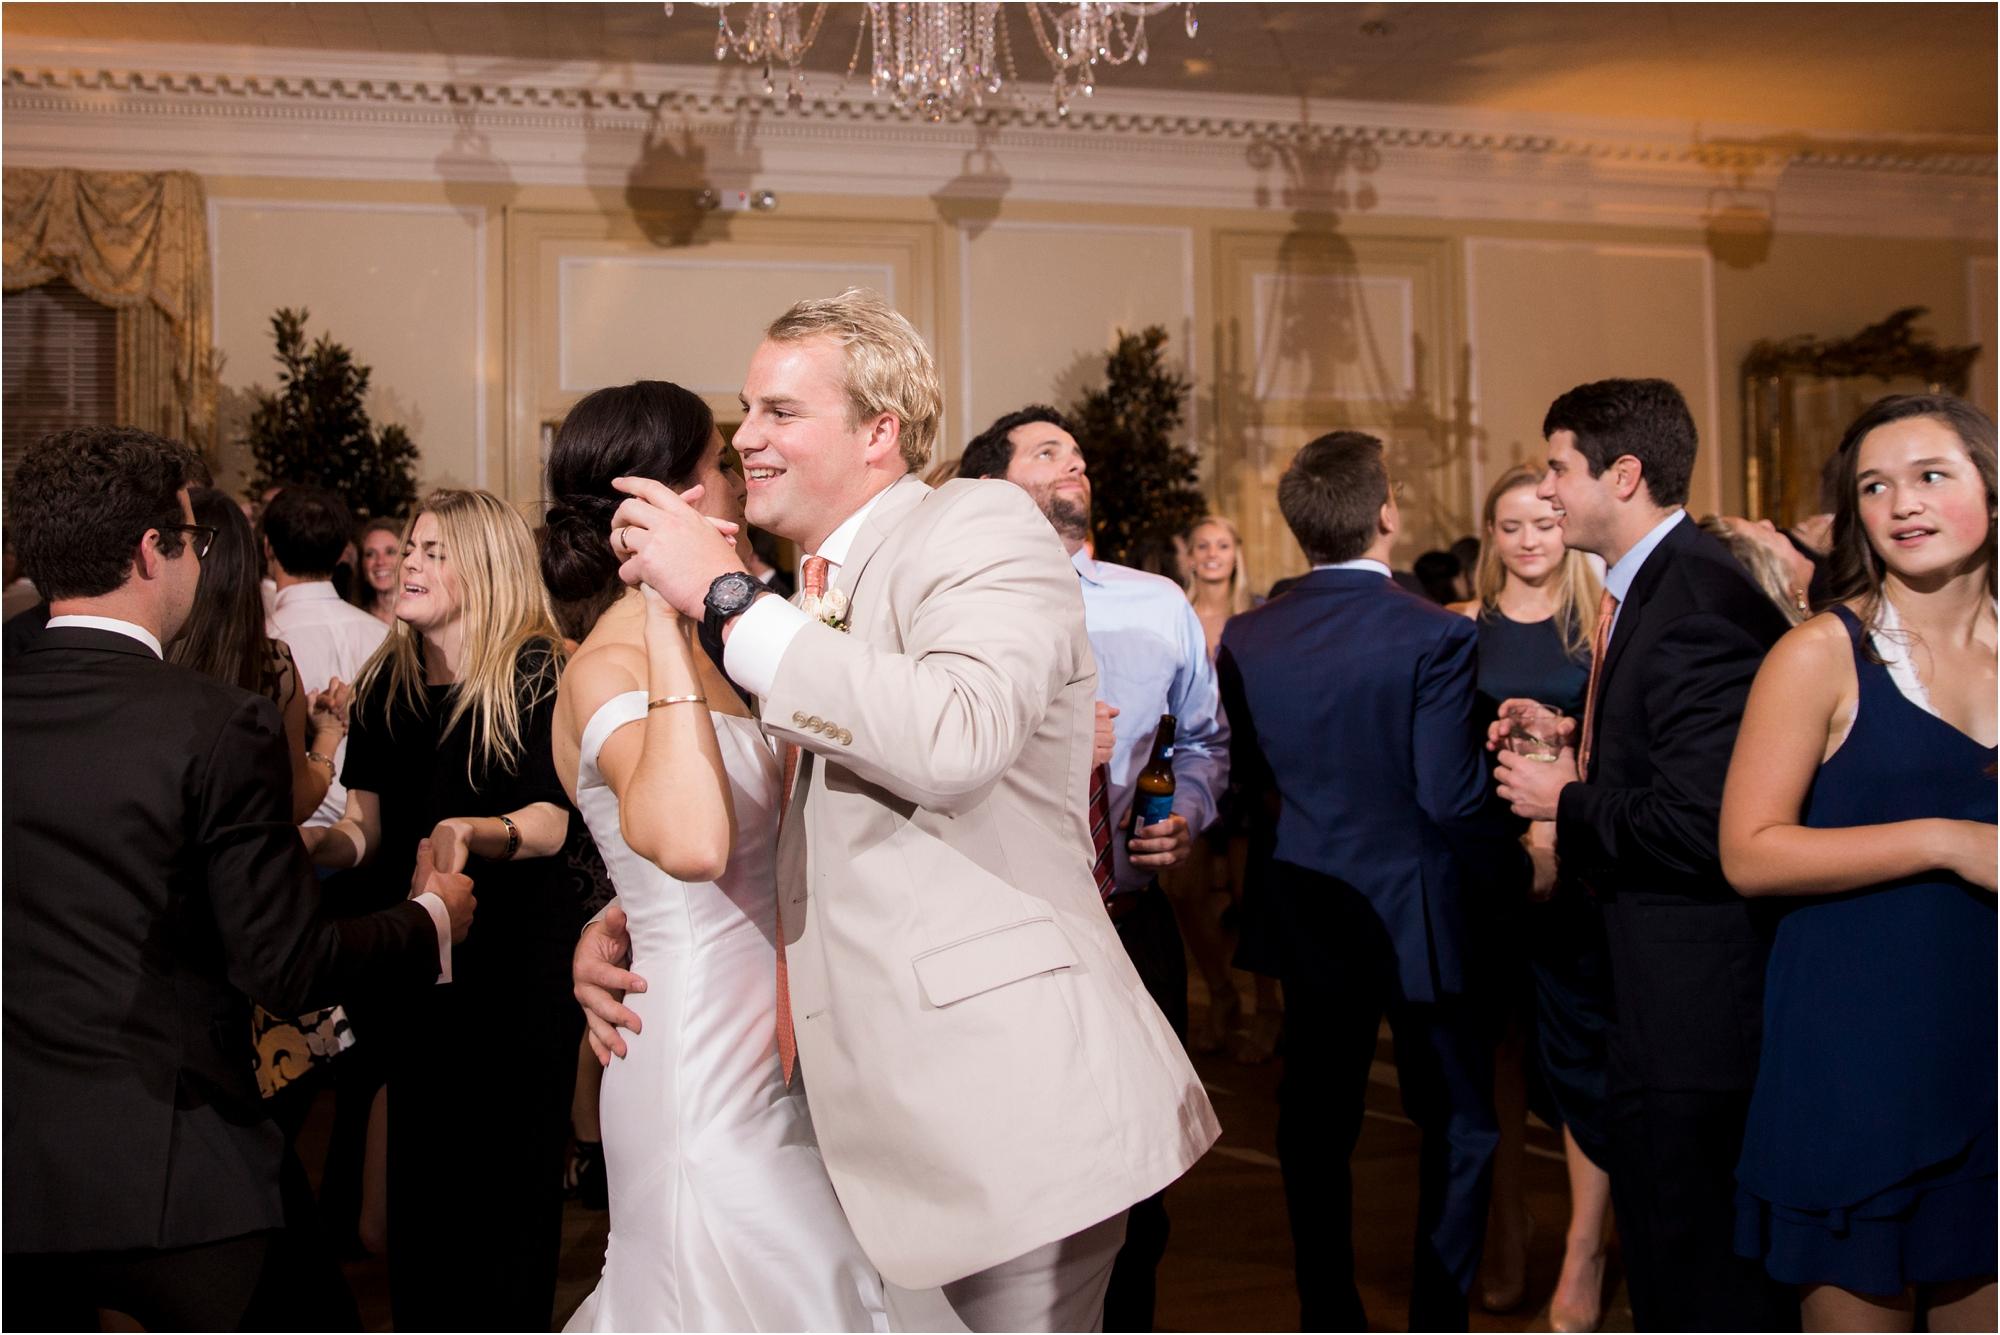 claire-thomas-farmington-country-club-charlottesville-virginia-wedding-photos_0052.jpg